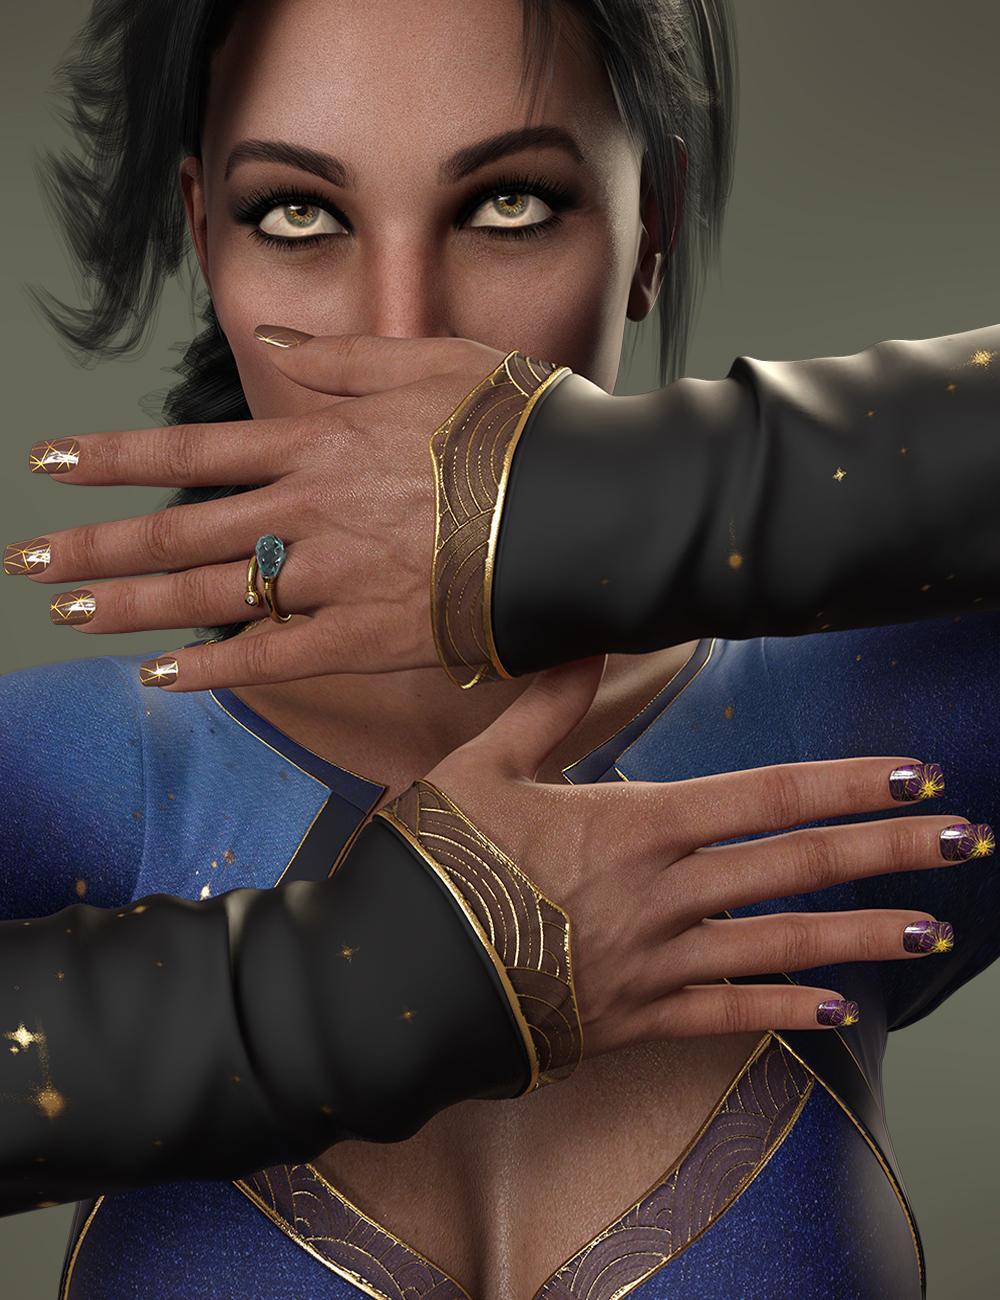 TMHL Nails 2 Merchant Resource for Genesis 8.1 Female by: TwiztedMetalhotlilme74, 3D Models by Daz 3D